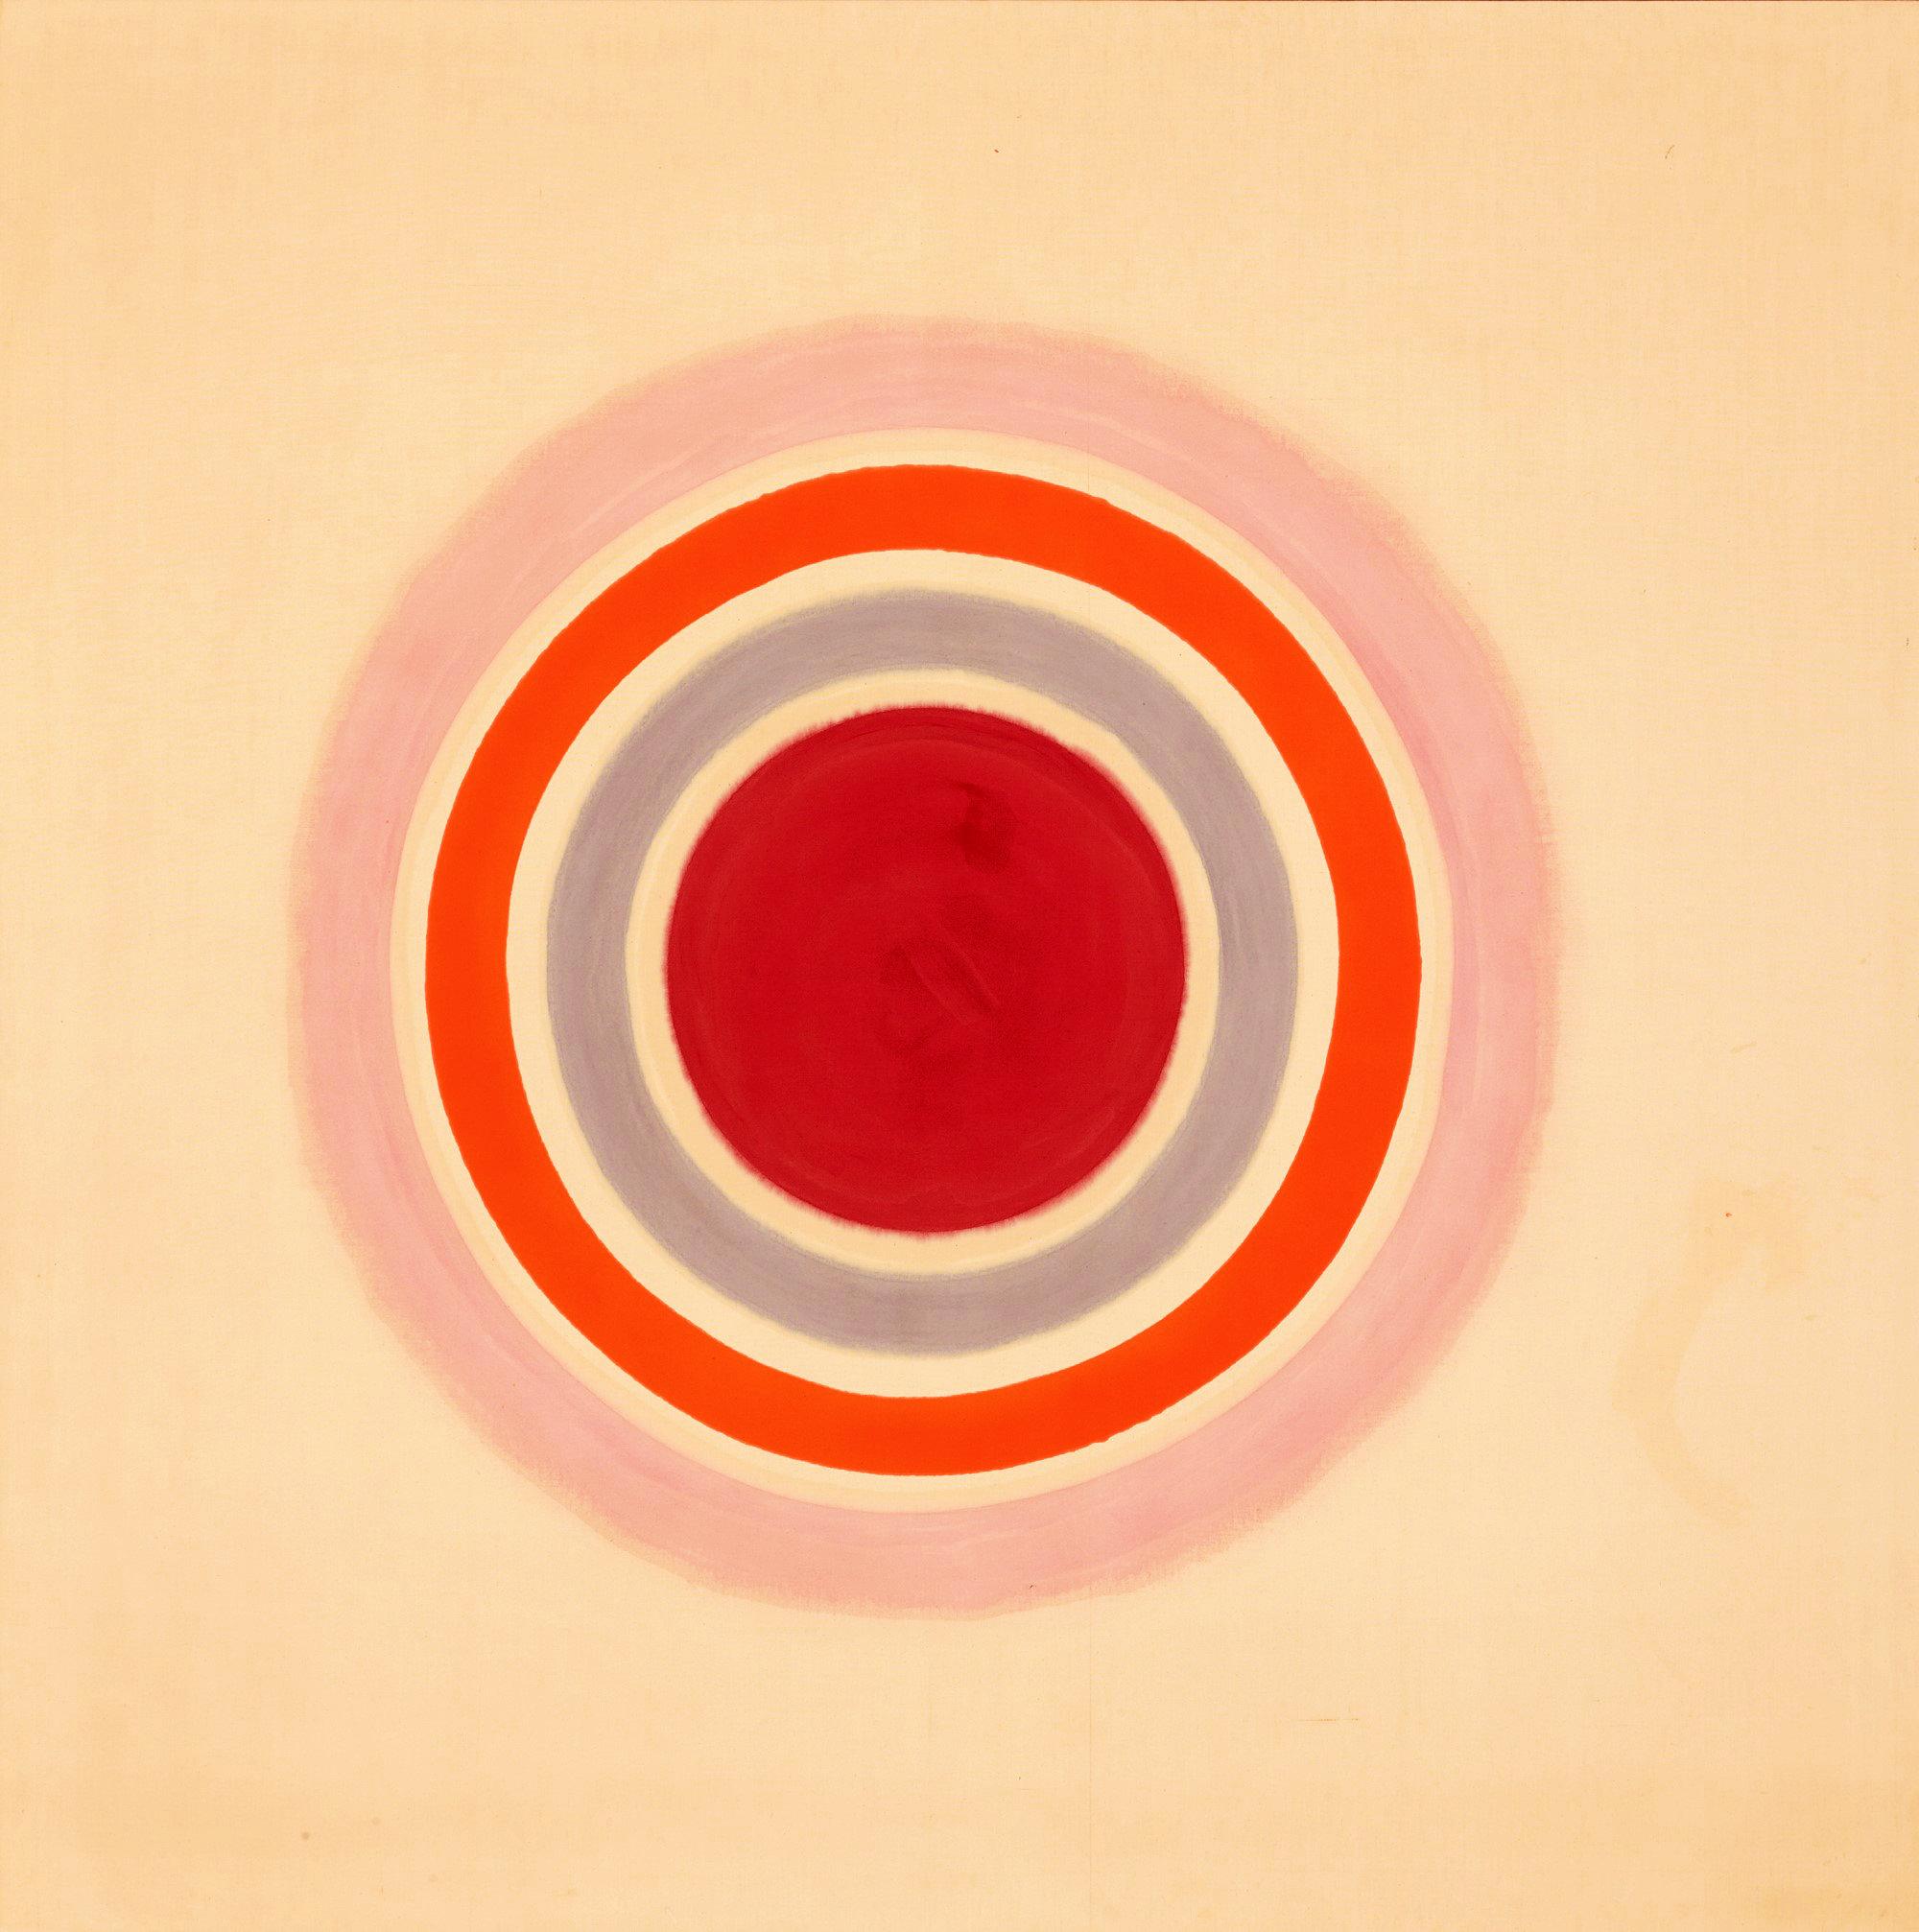 Kenneth Noland, Spring Call , 1961. Acrylic on canvas. 82.5 x 82.5 inches.209.6 x 209.6 cm